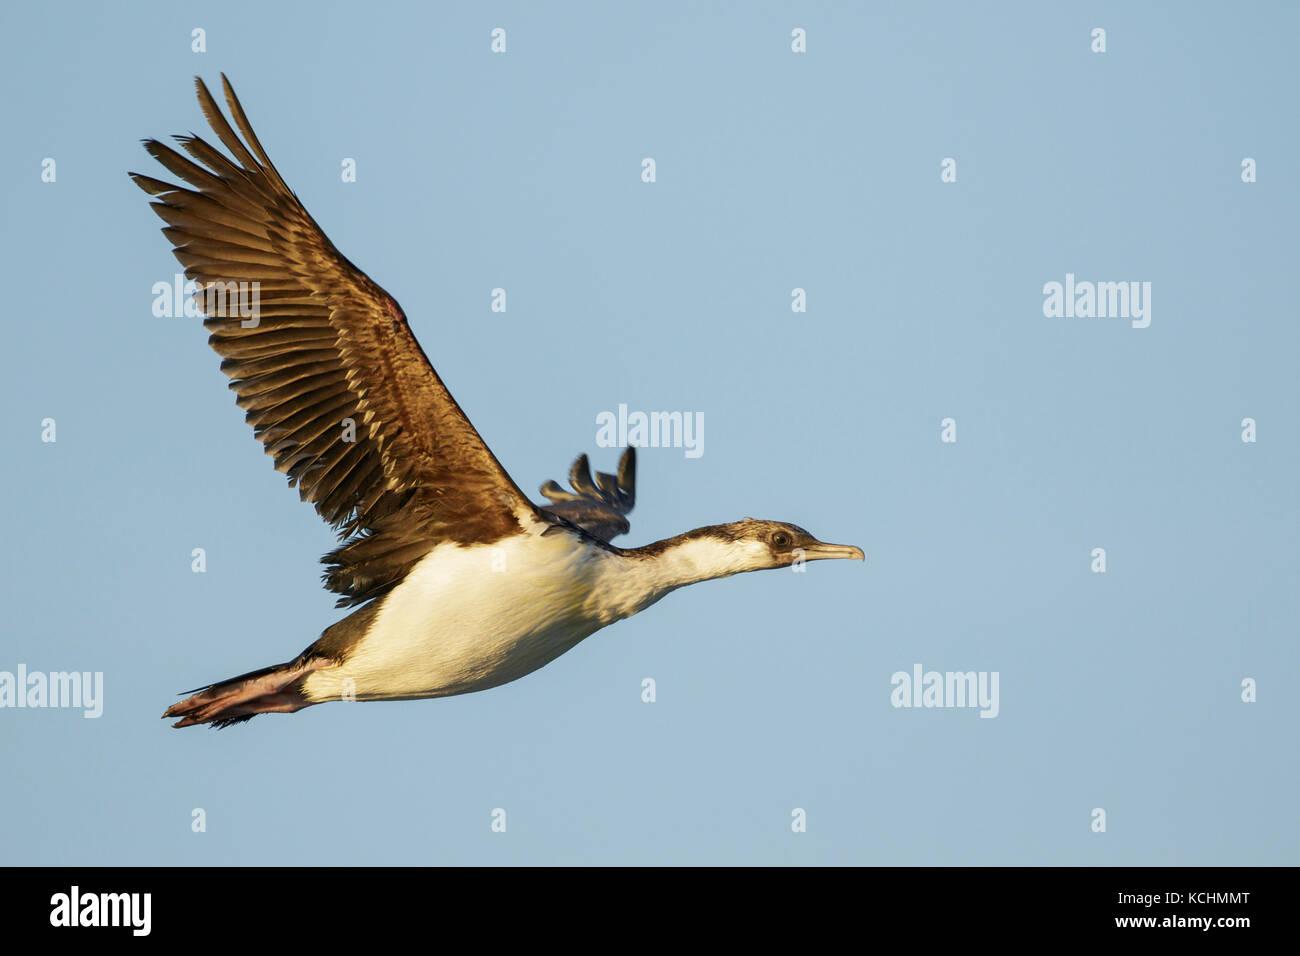 South Georgia Shag (Phalacrocorax georgianus) flying over the ocean searching for food near South Georgia Island. - Stock Image